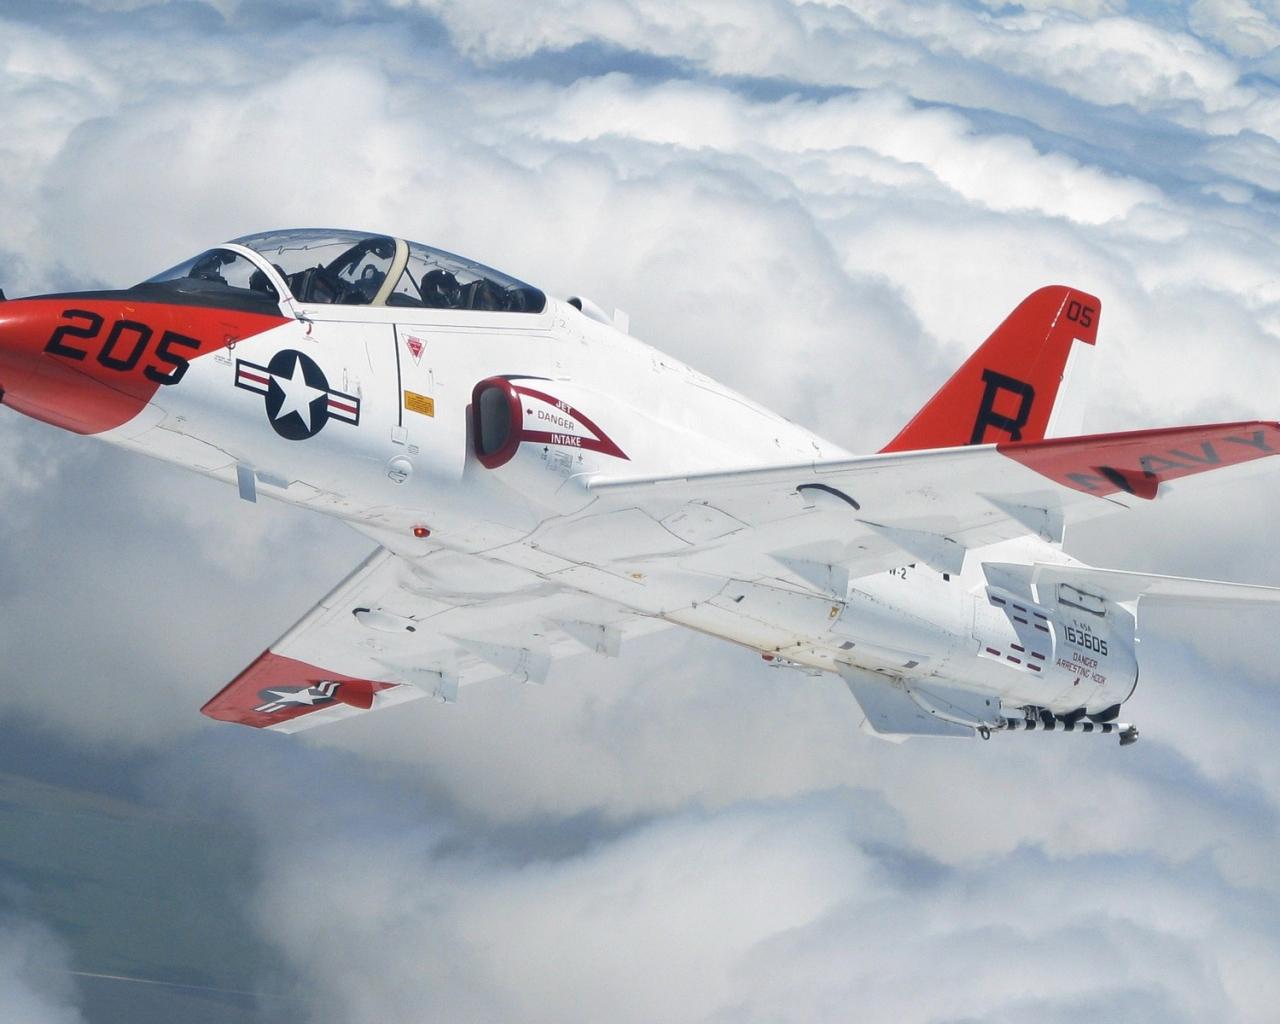 Avion de Guerra en los aires - 1280x1024